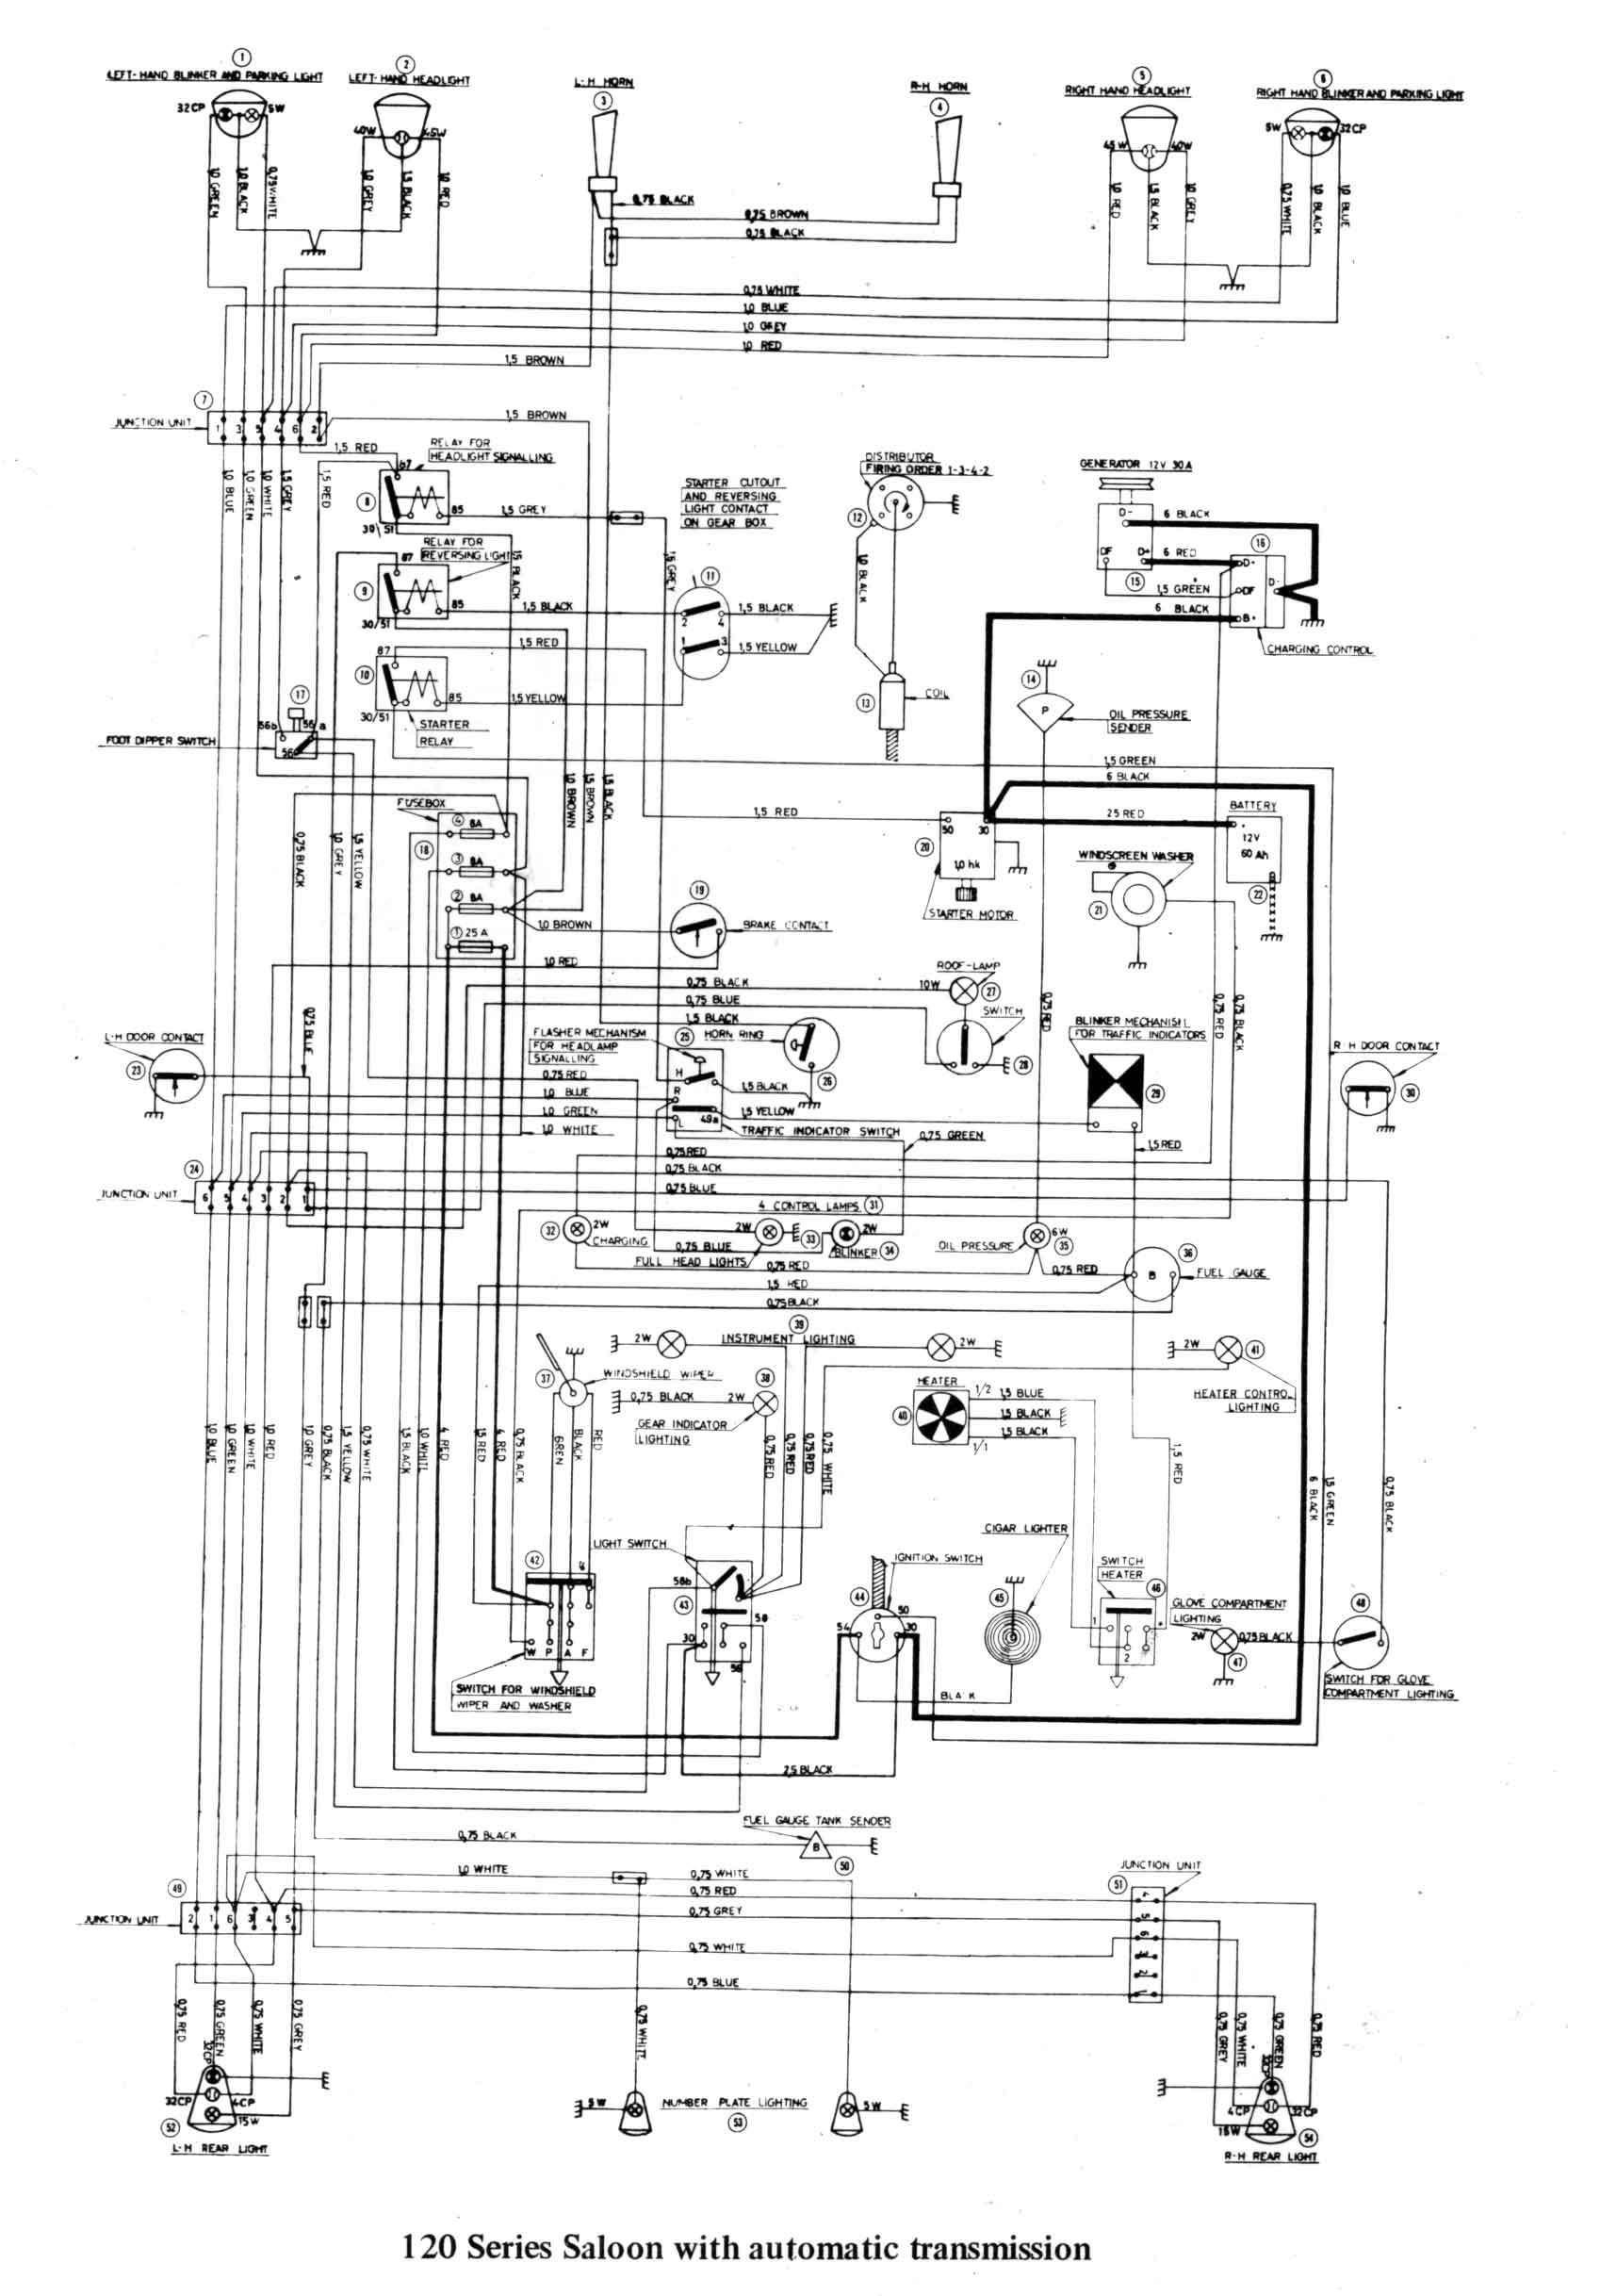 92 95 16L MFI engine wiring